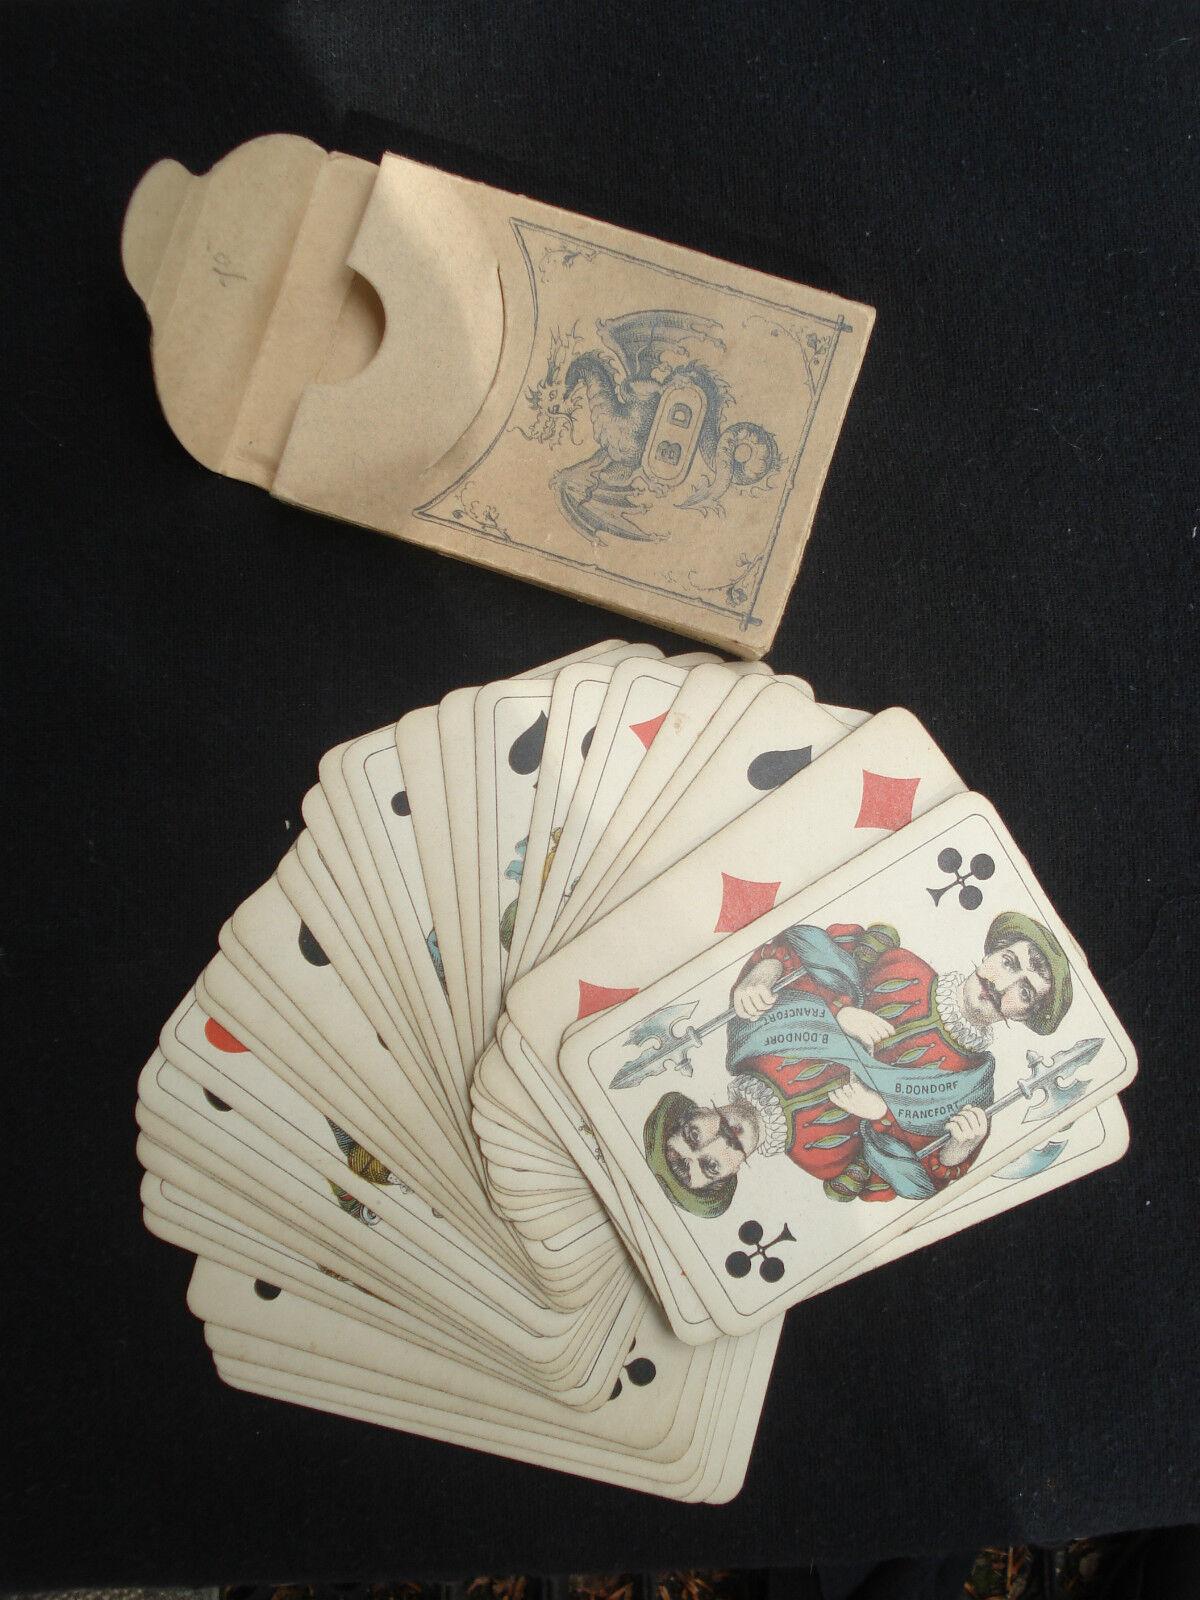 ANCIEN JEU DONDORF FRANKFURT N° 105 PIQUET 36 CARTES ANTIQUE PLAYING CARDS